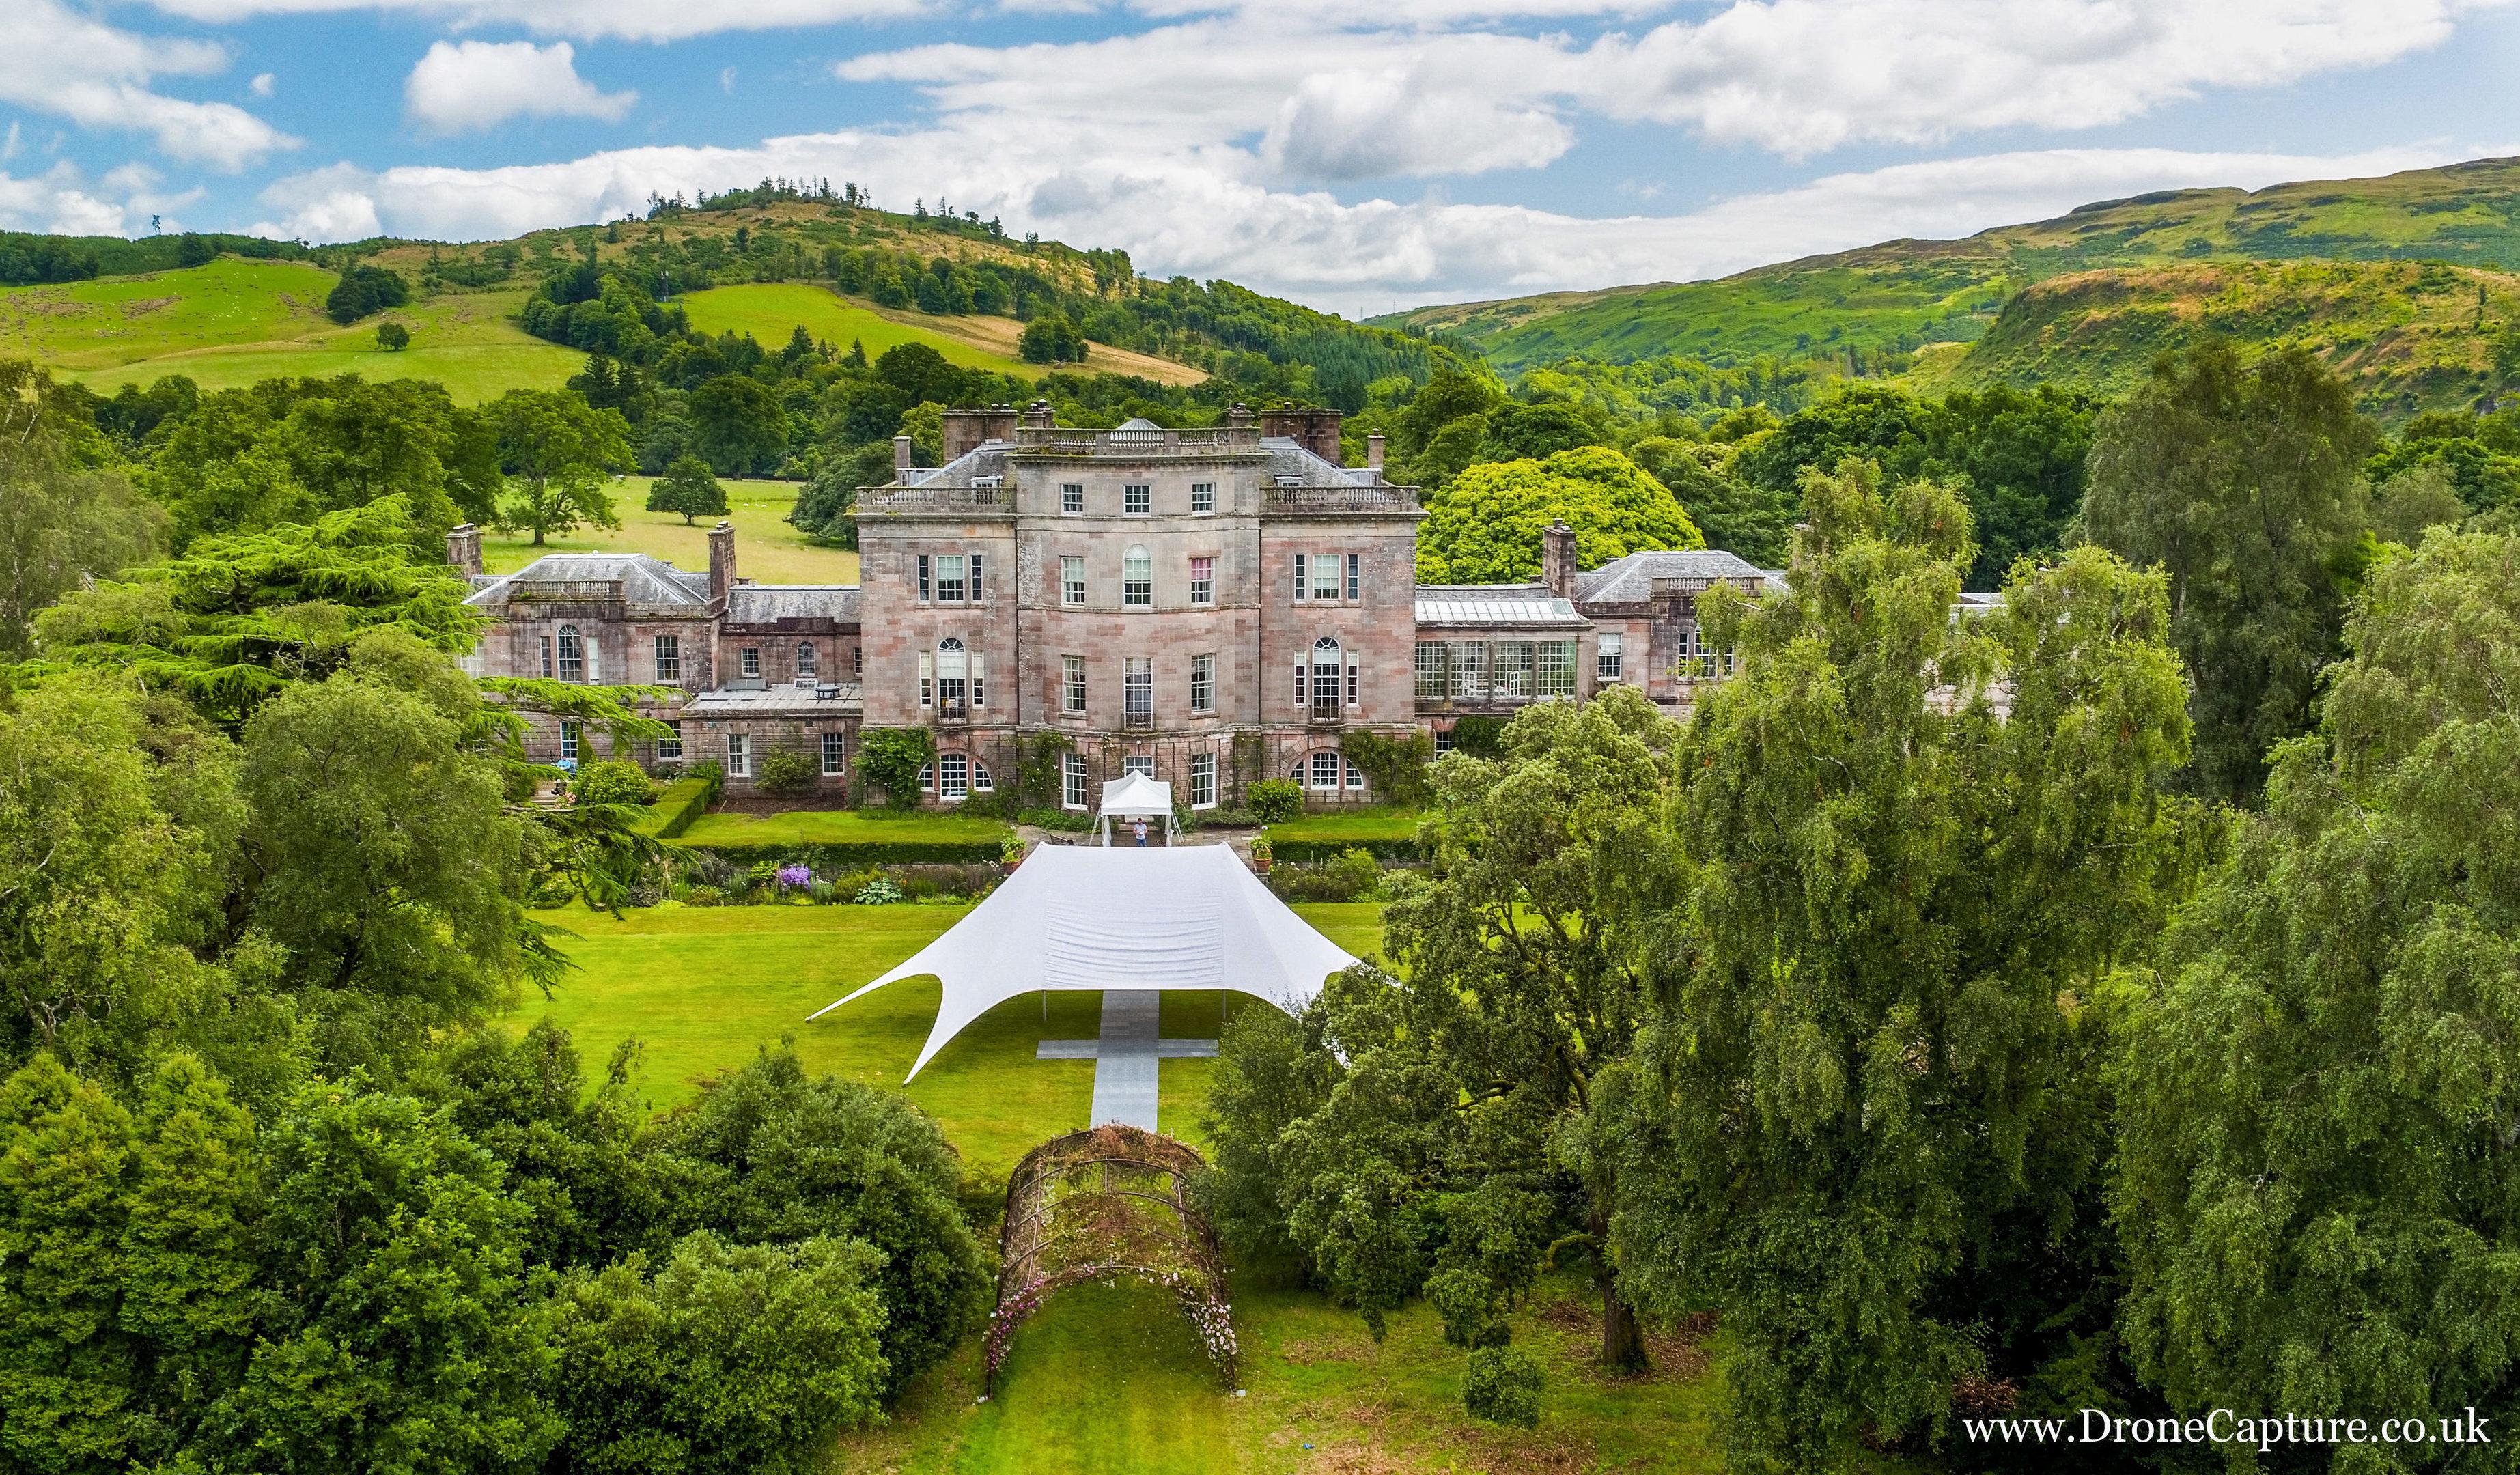 Ardgowan Estate (www.dronecapture.co.uk)